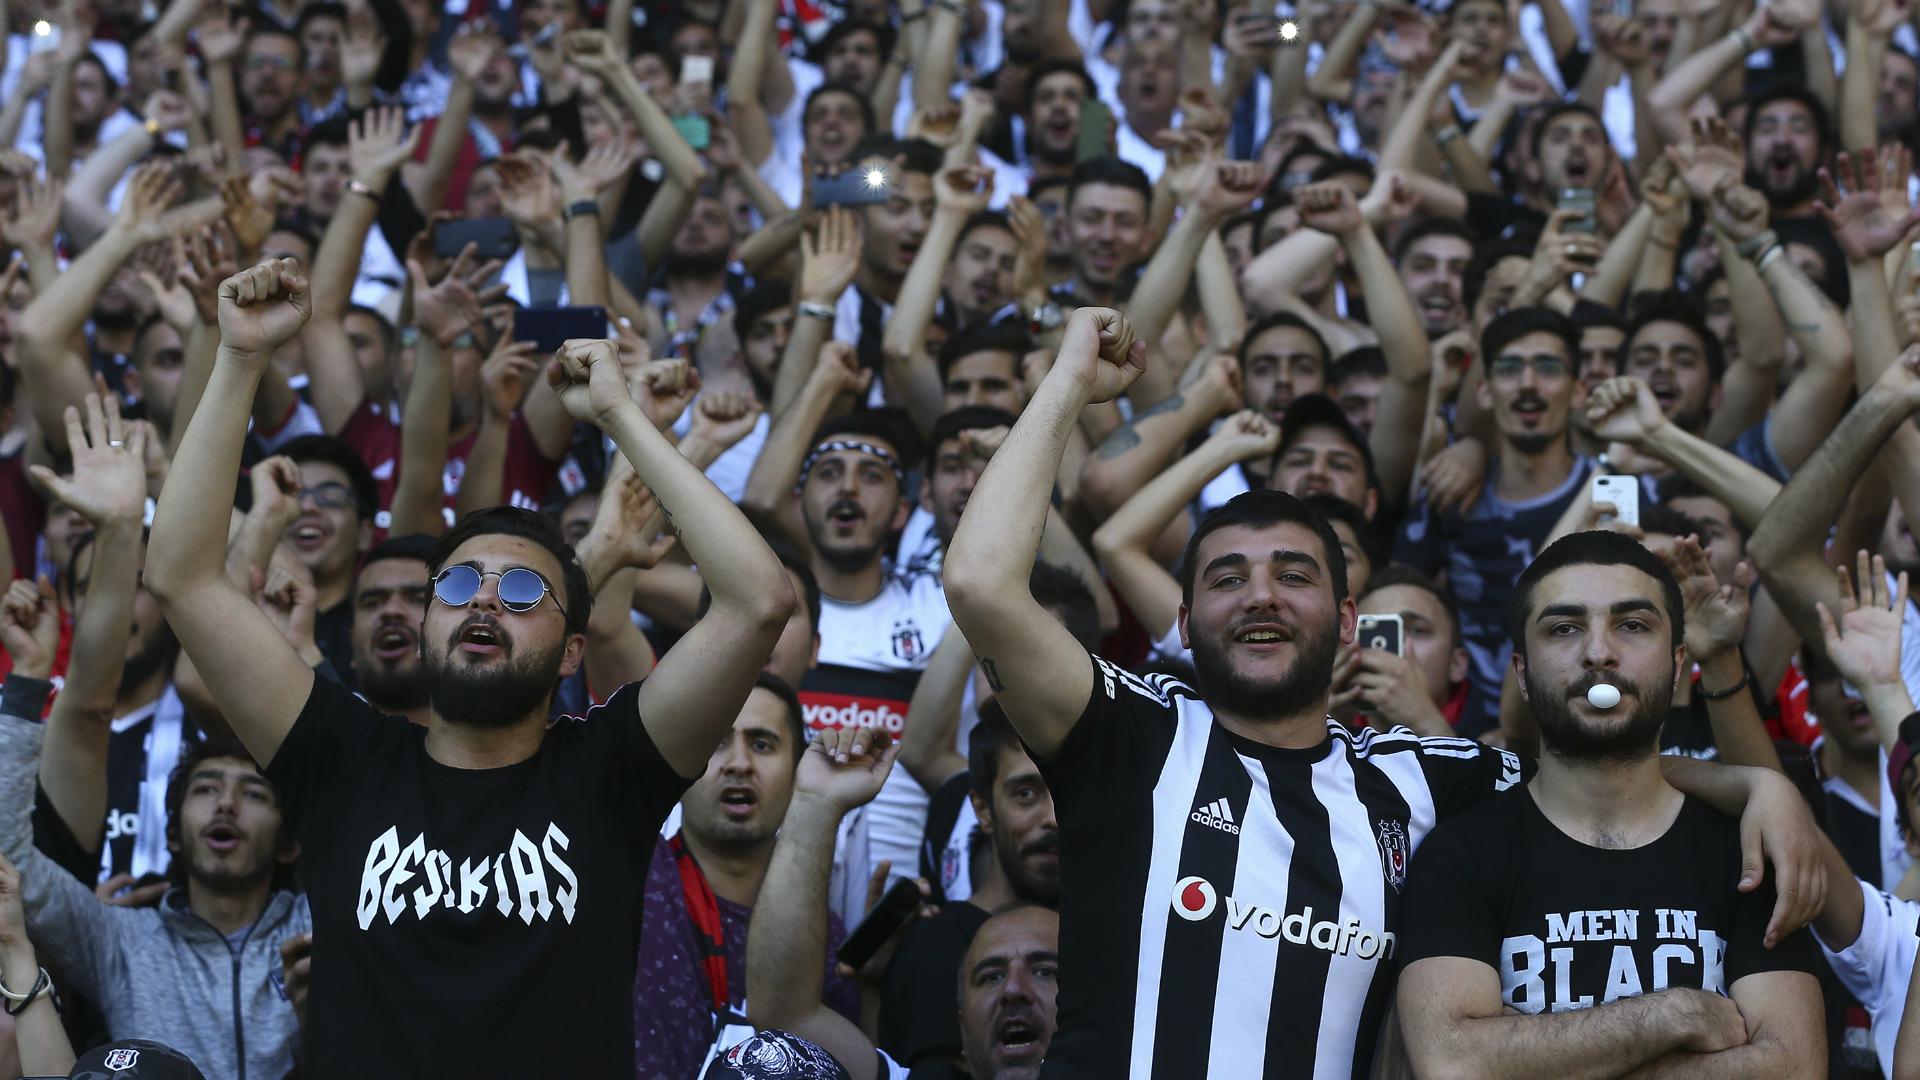 Besiktas fans at Gaziantep